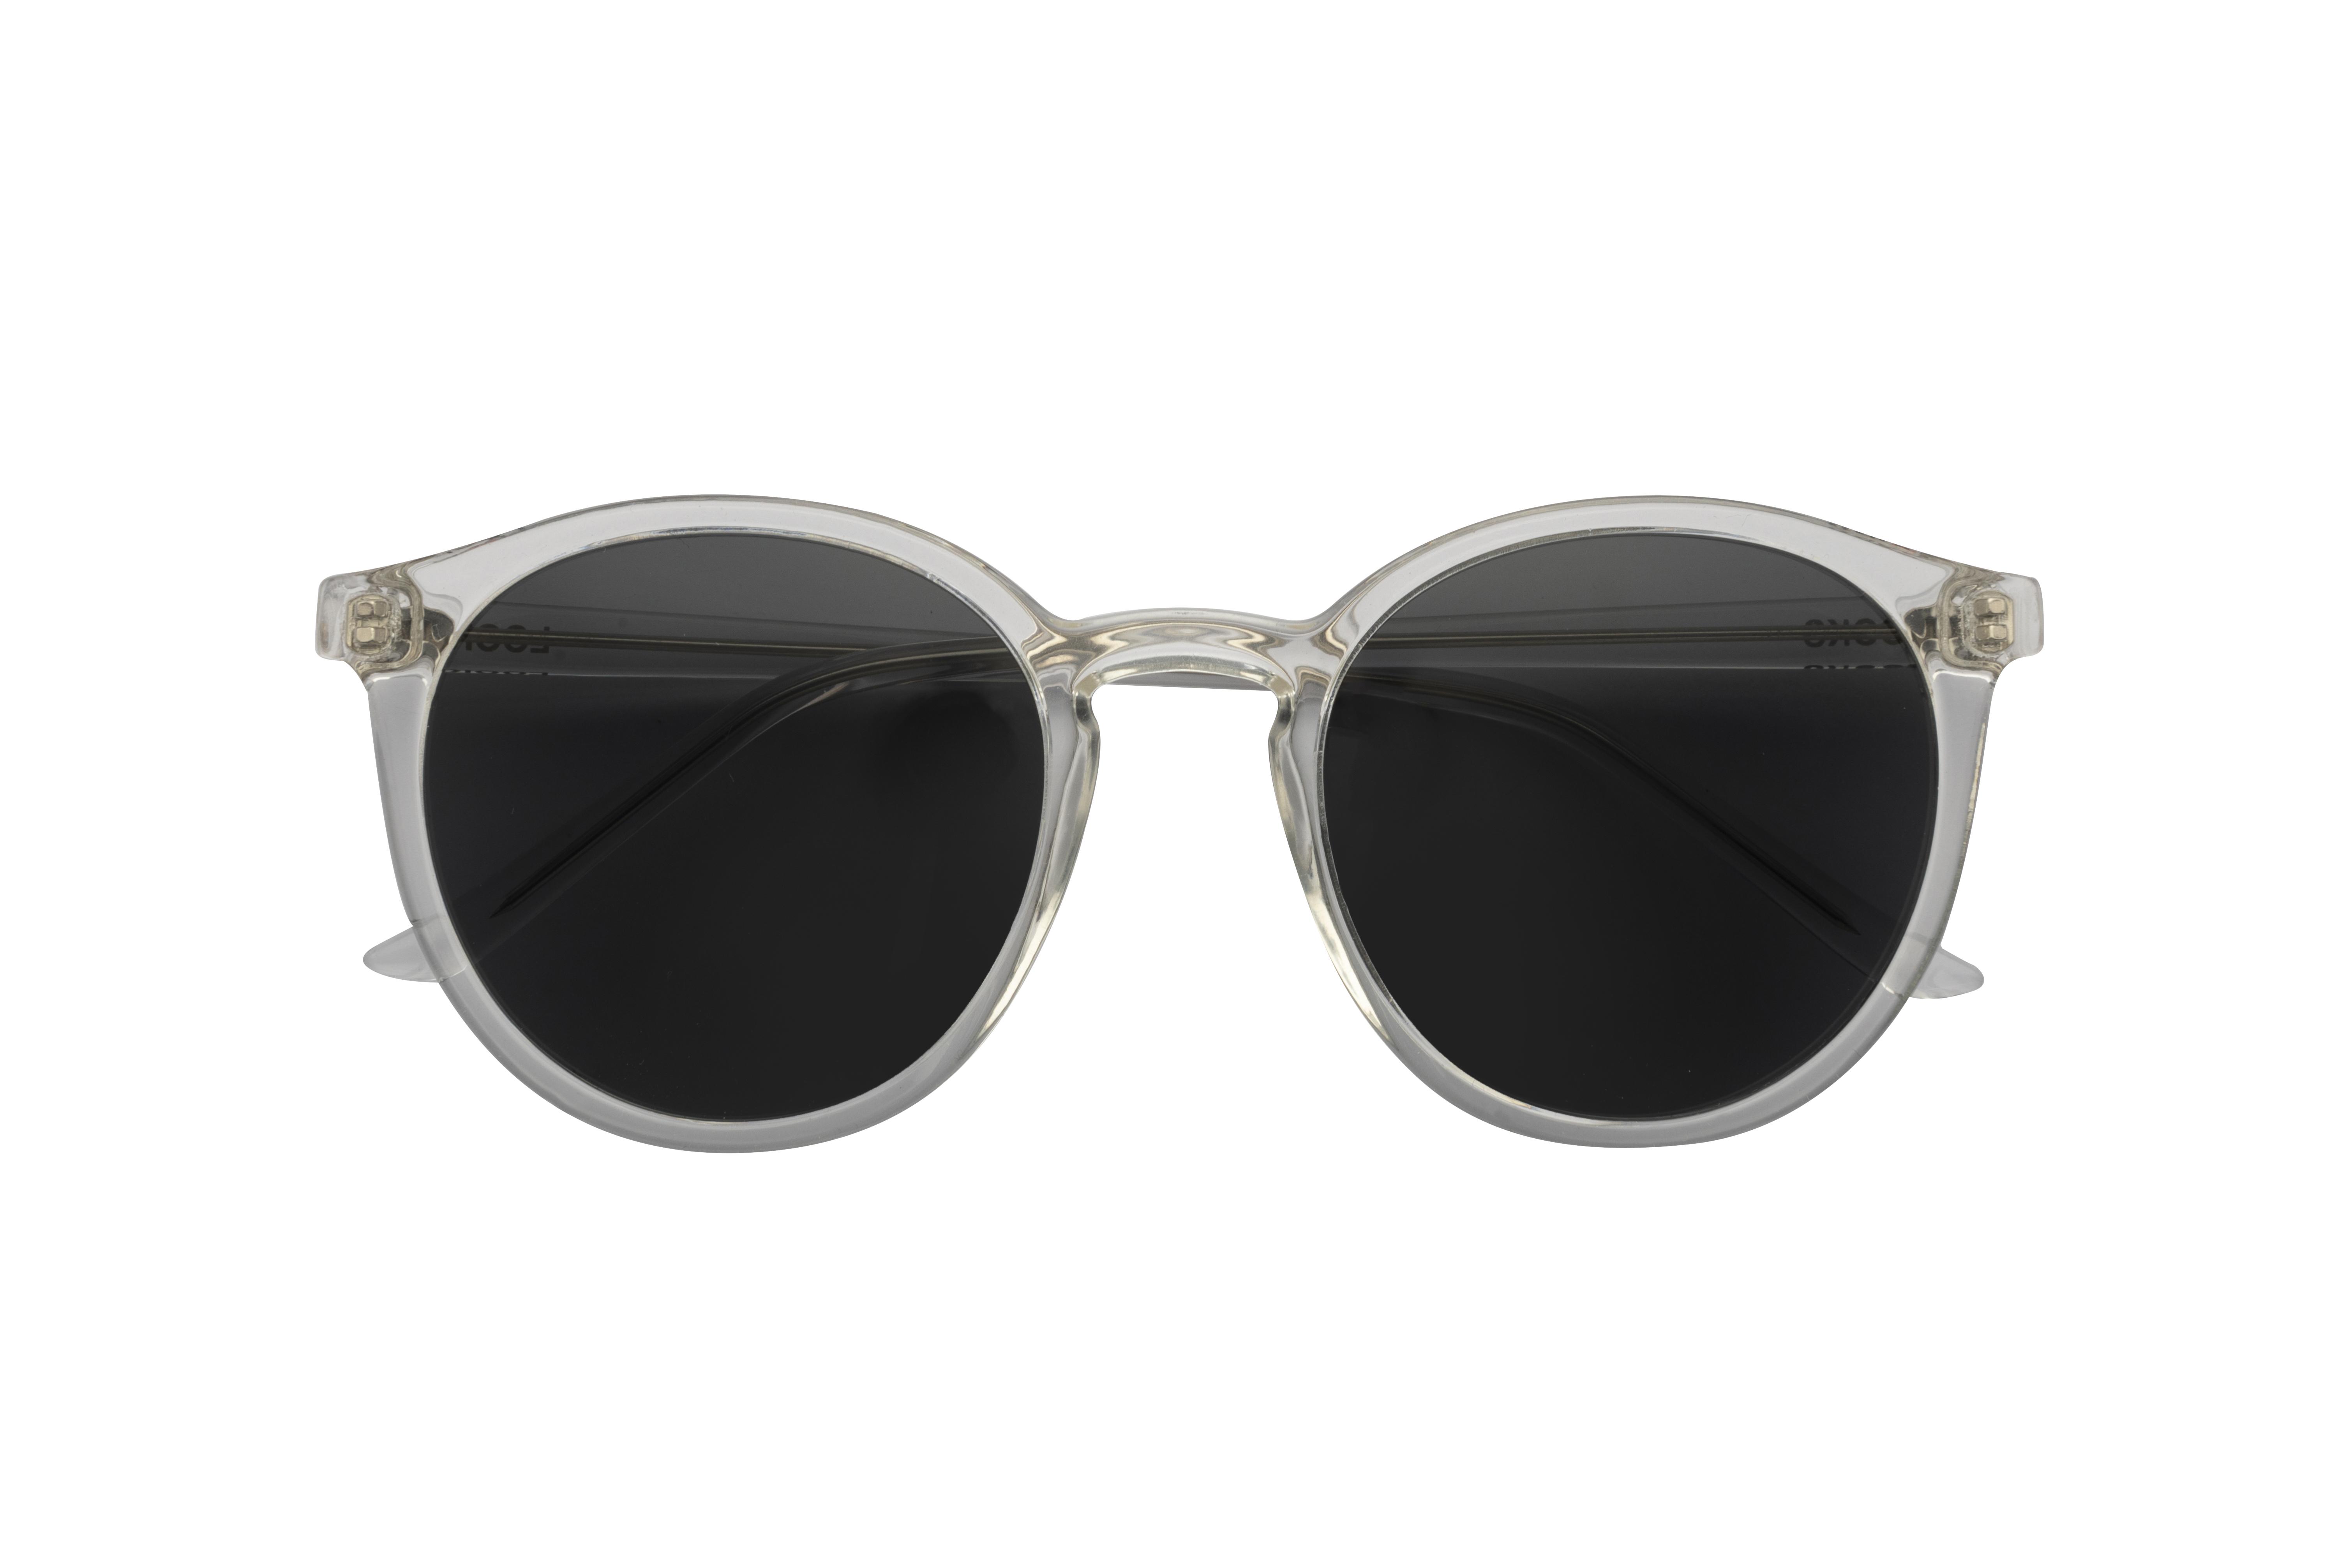 Transparente Sonnenbrille im Notched Bridge Style